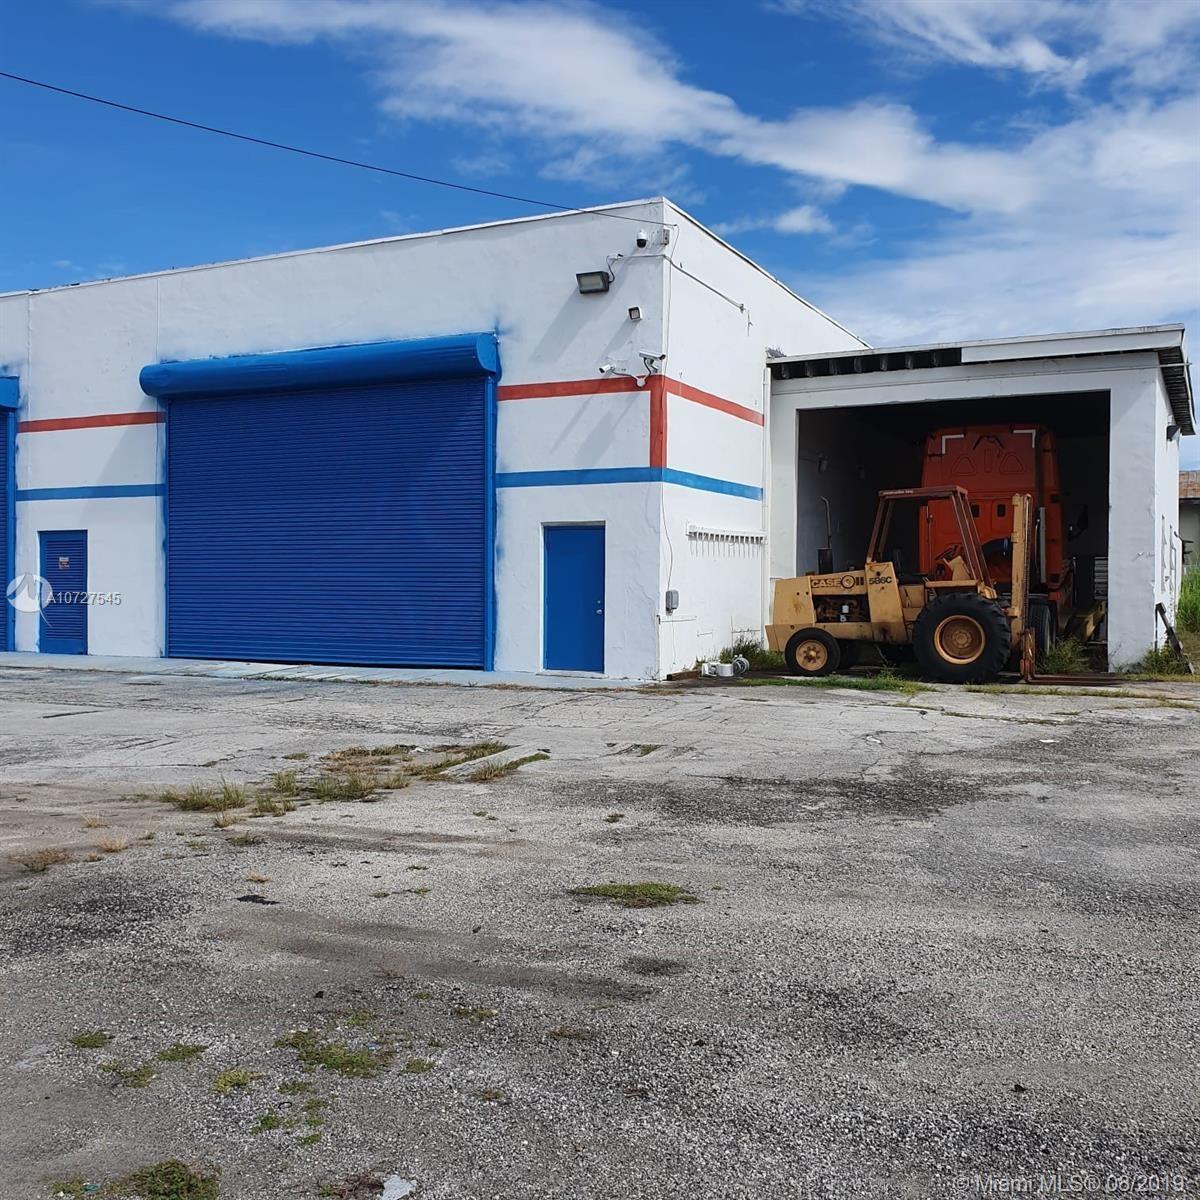 15151 W Dixie Hwy   A, North Miami Beach, FL 33162